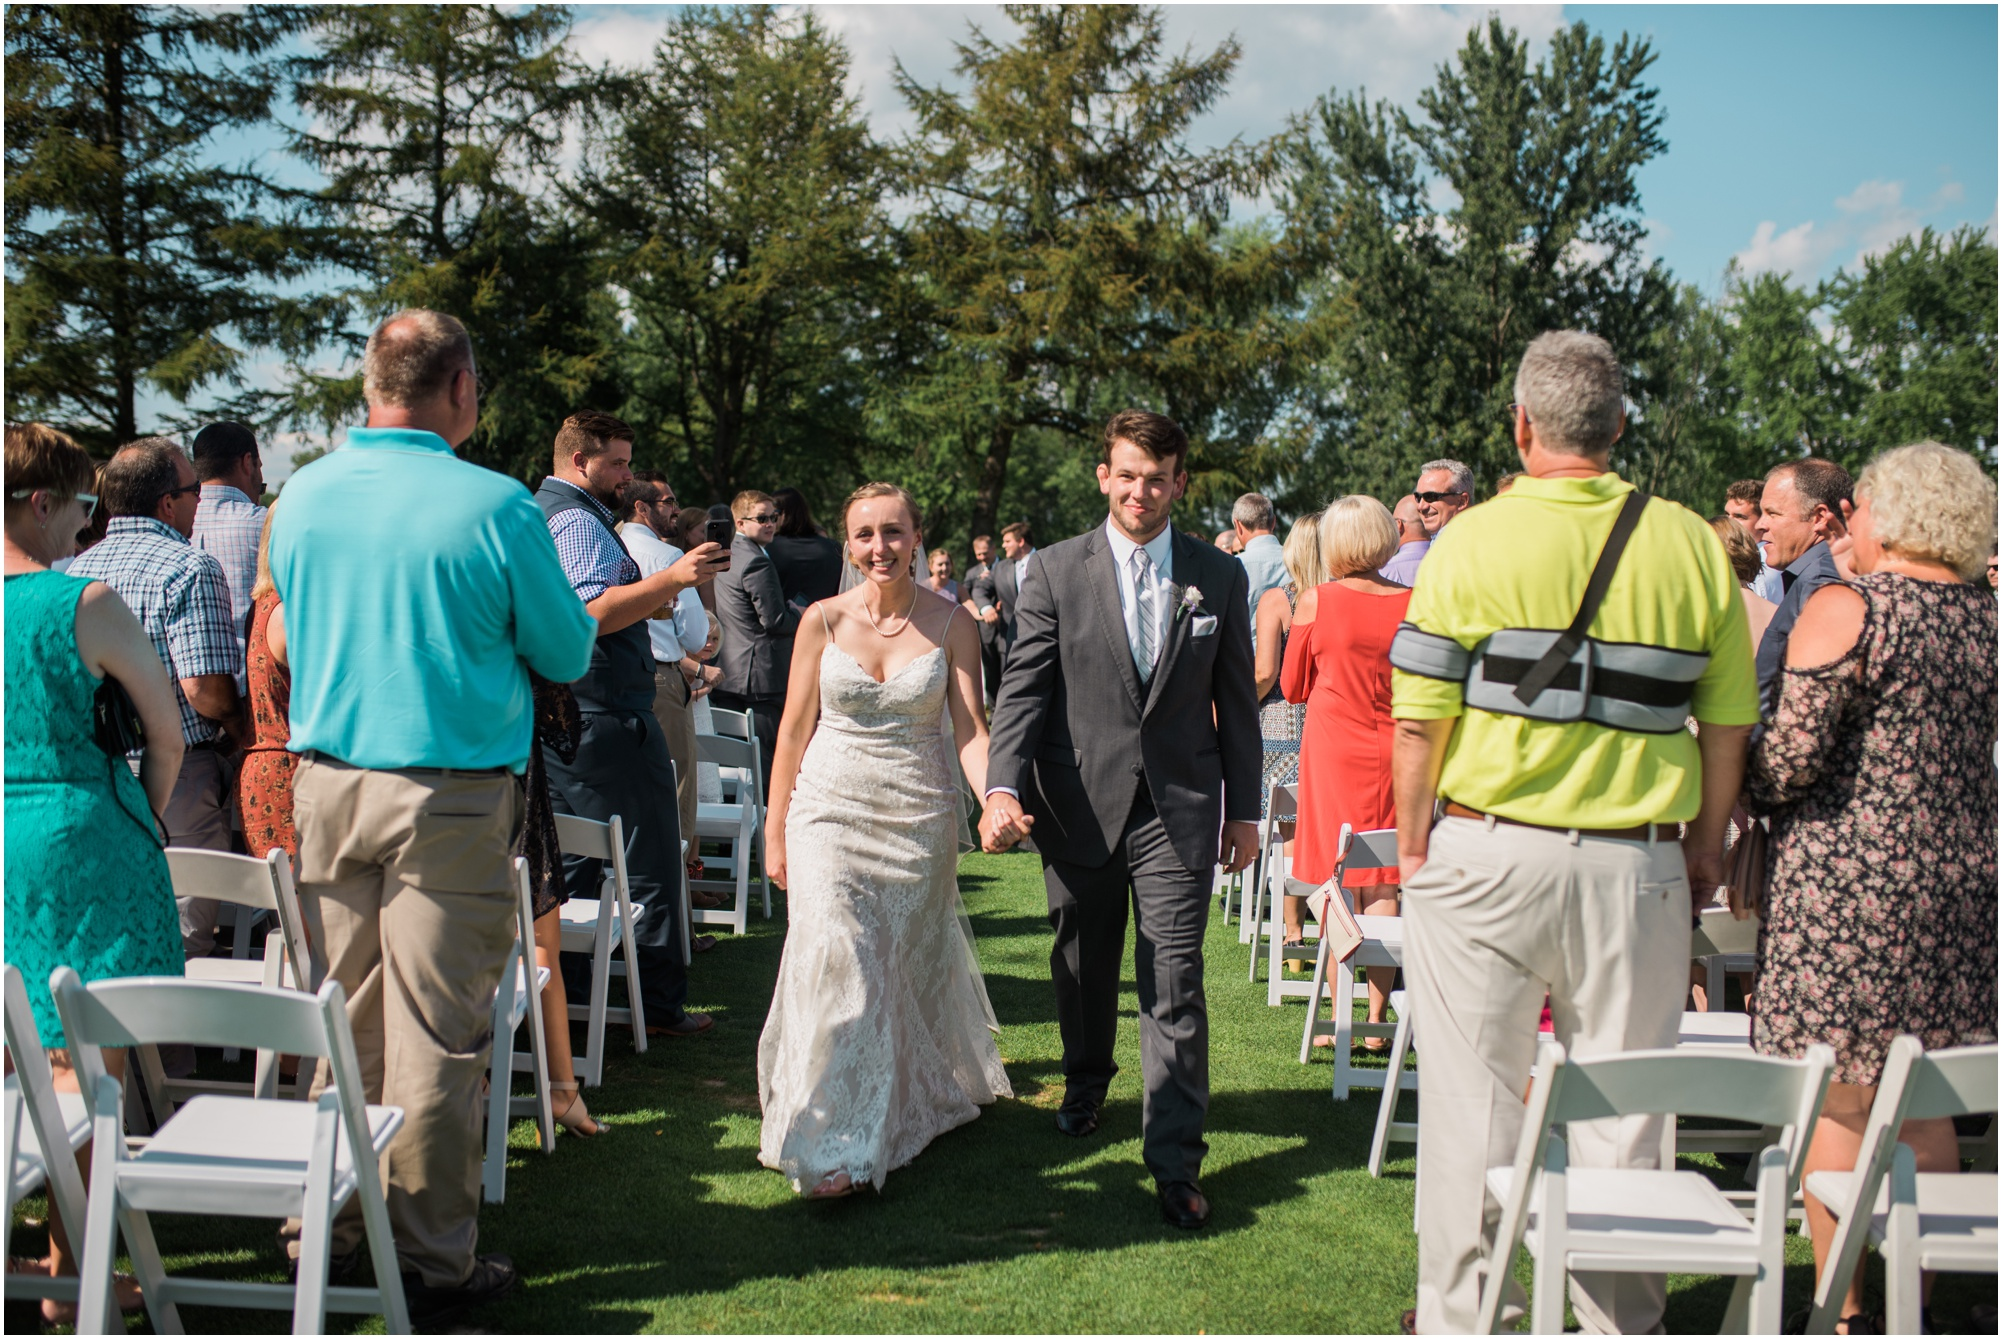 Wisconsin-Wedding-Photographer-Reedsburg-Country-Club-Kaela-and Matt-Wedding-527.jpg